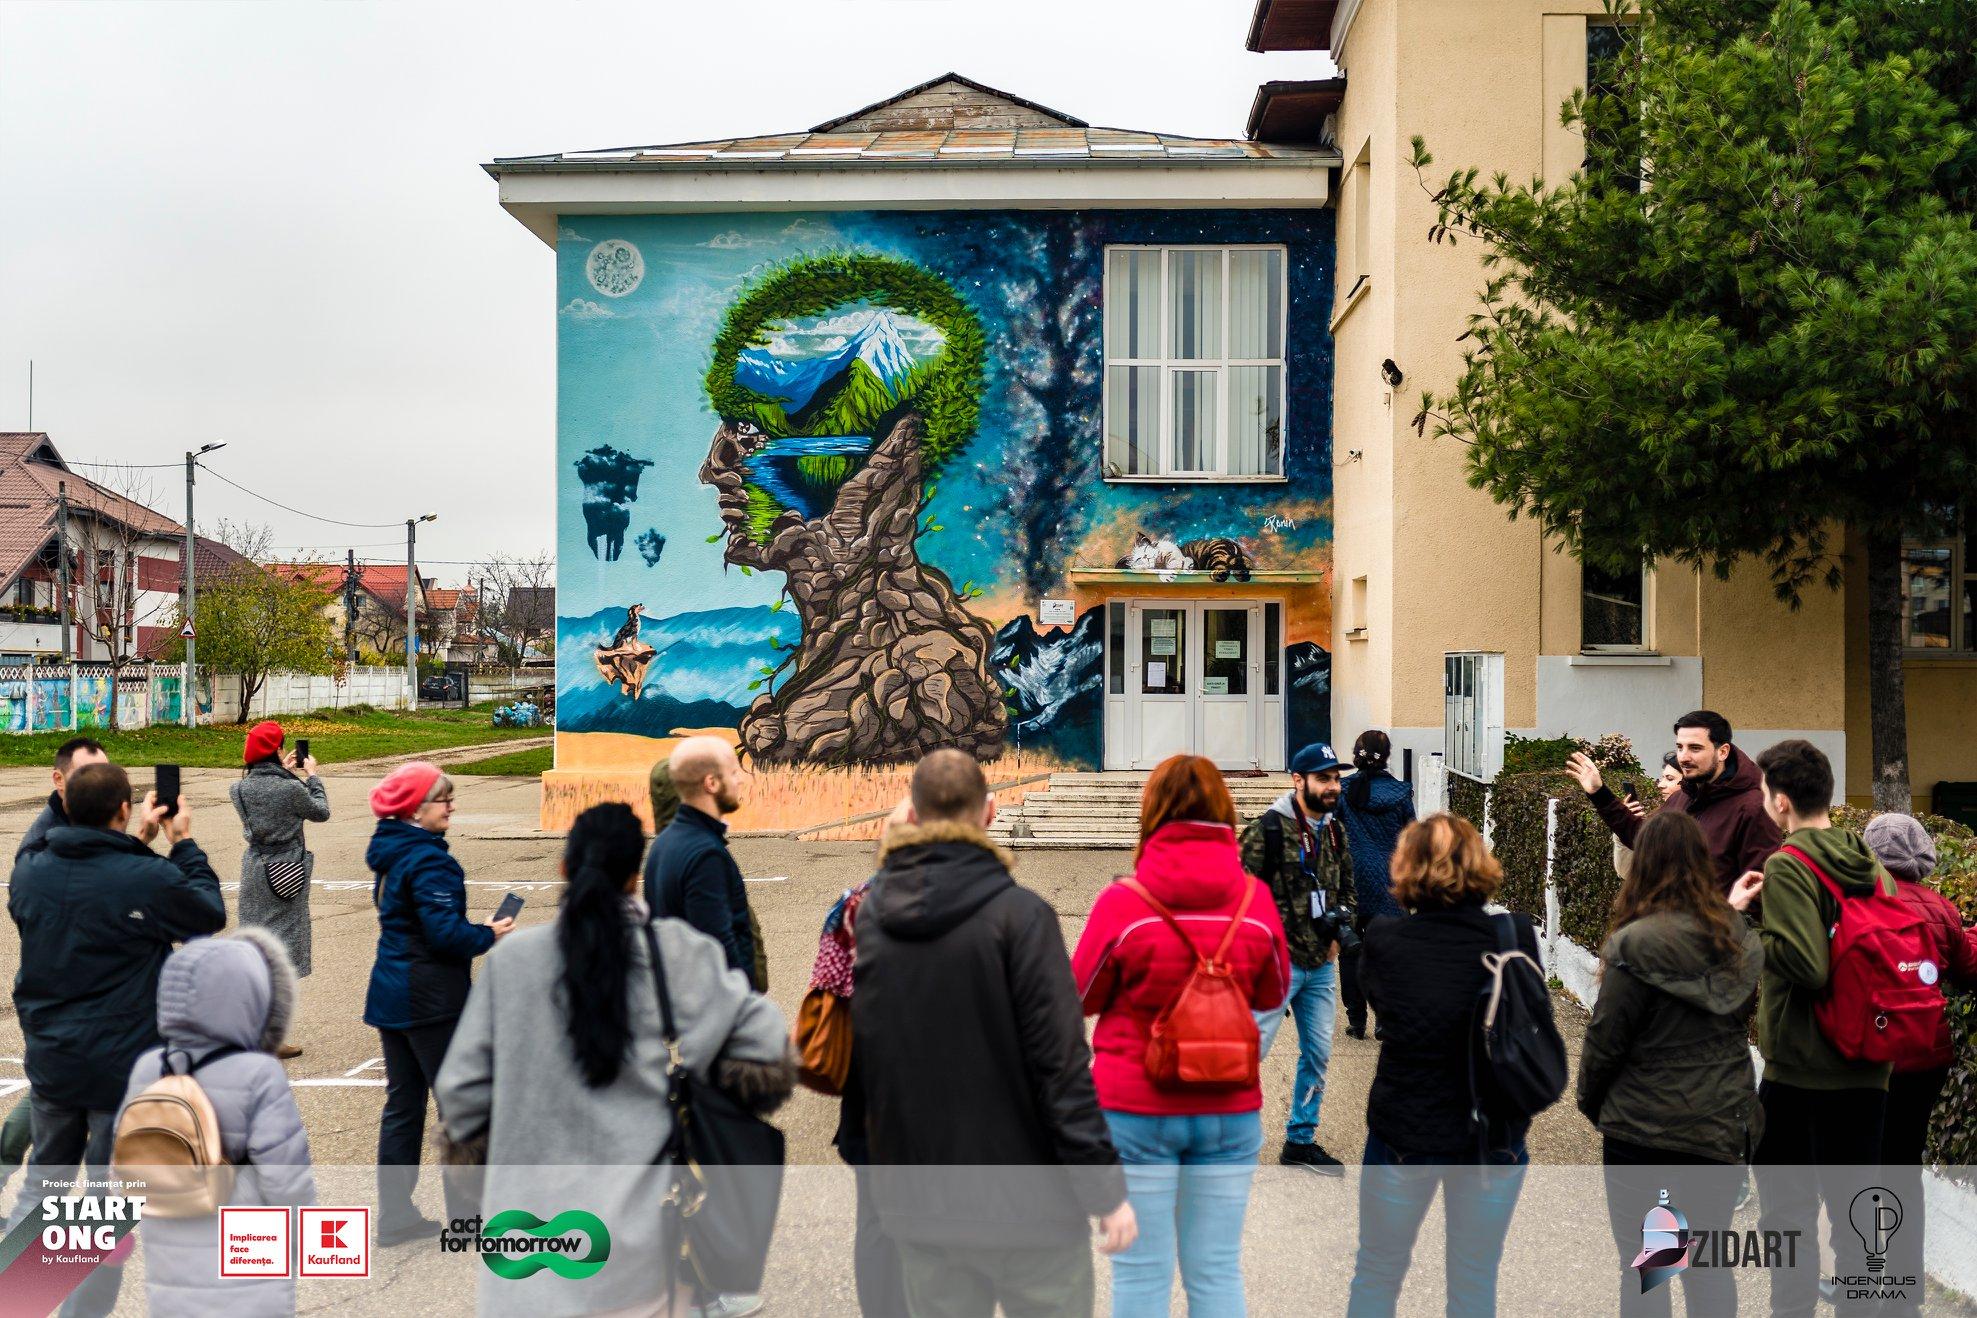 Comunitatea Zidart si picturi purificatoare de aer